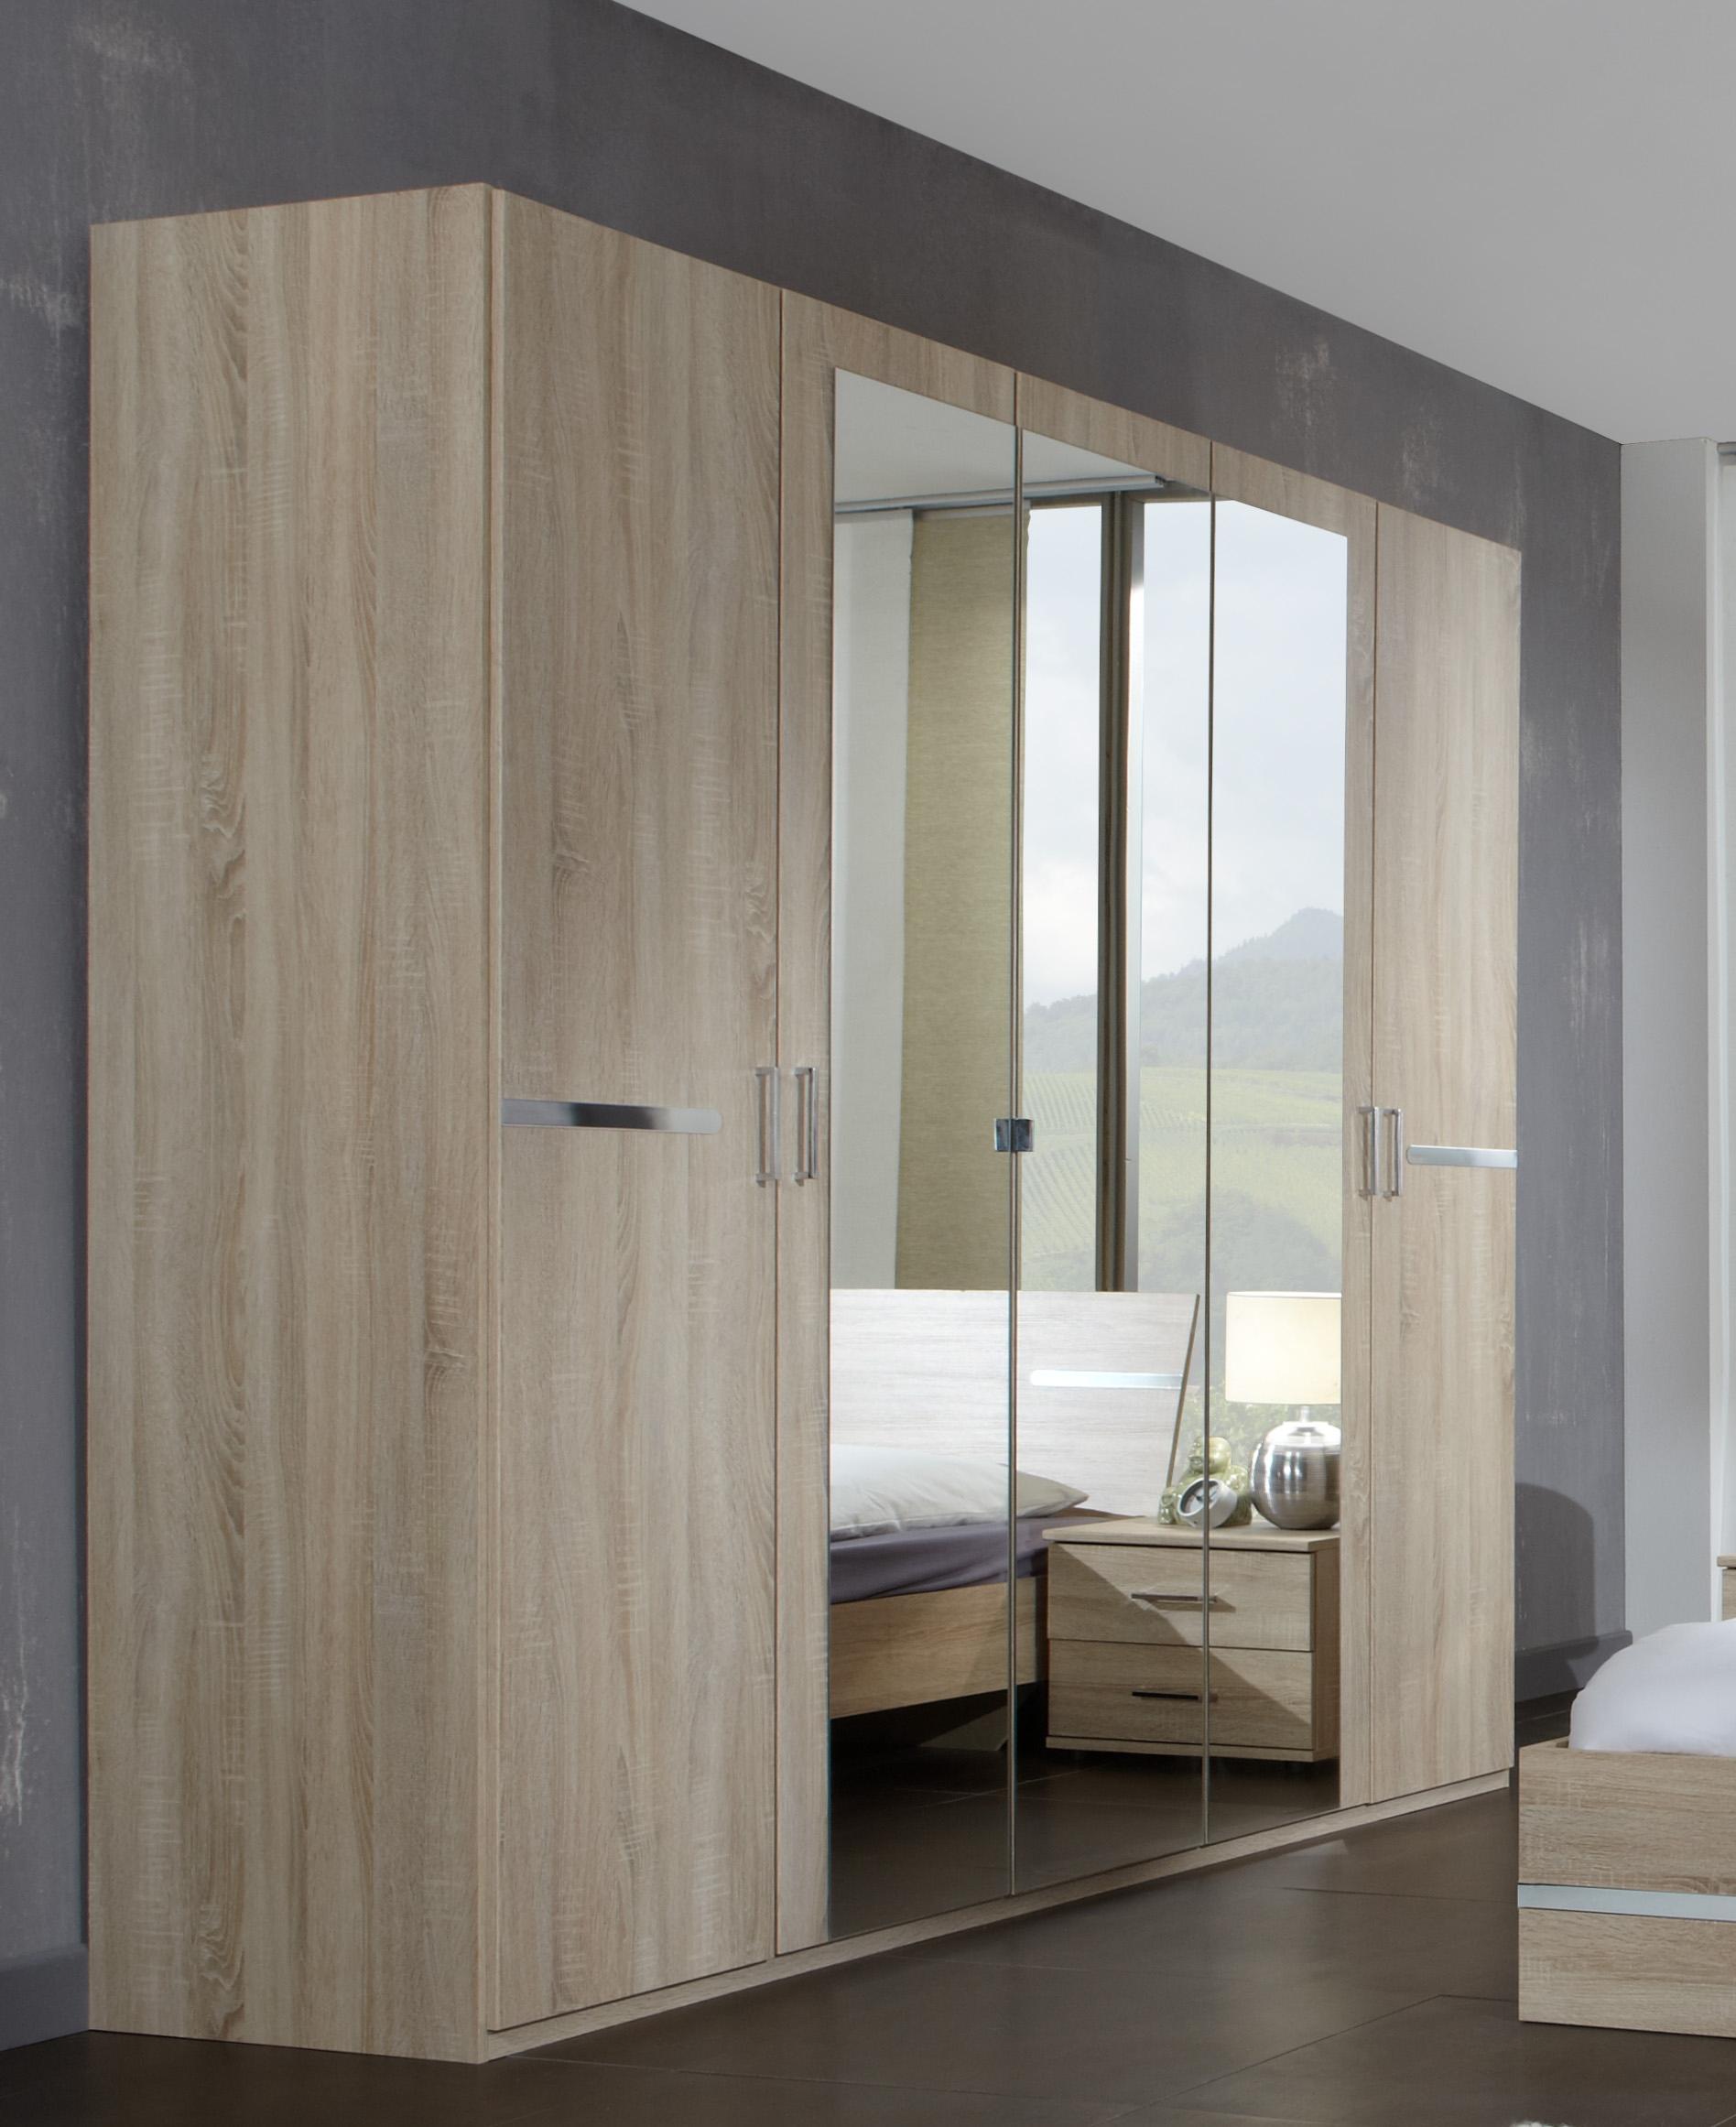 Armoire contemporaine 5 portes 225 cm chêne/chrome brillant Anabelle